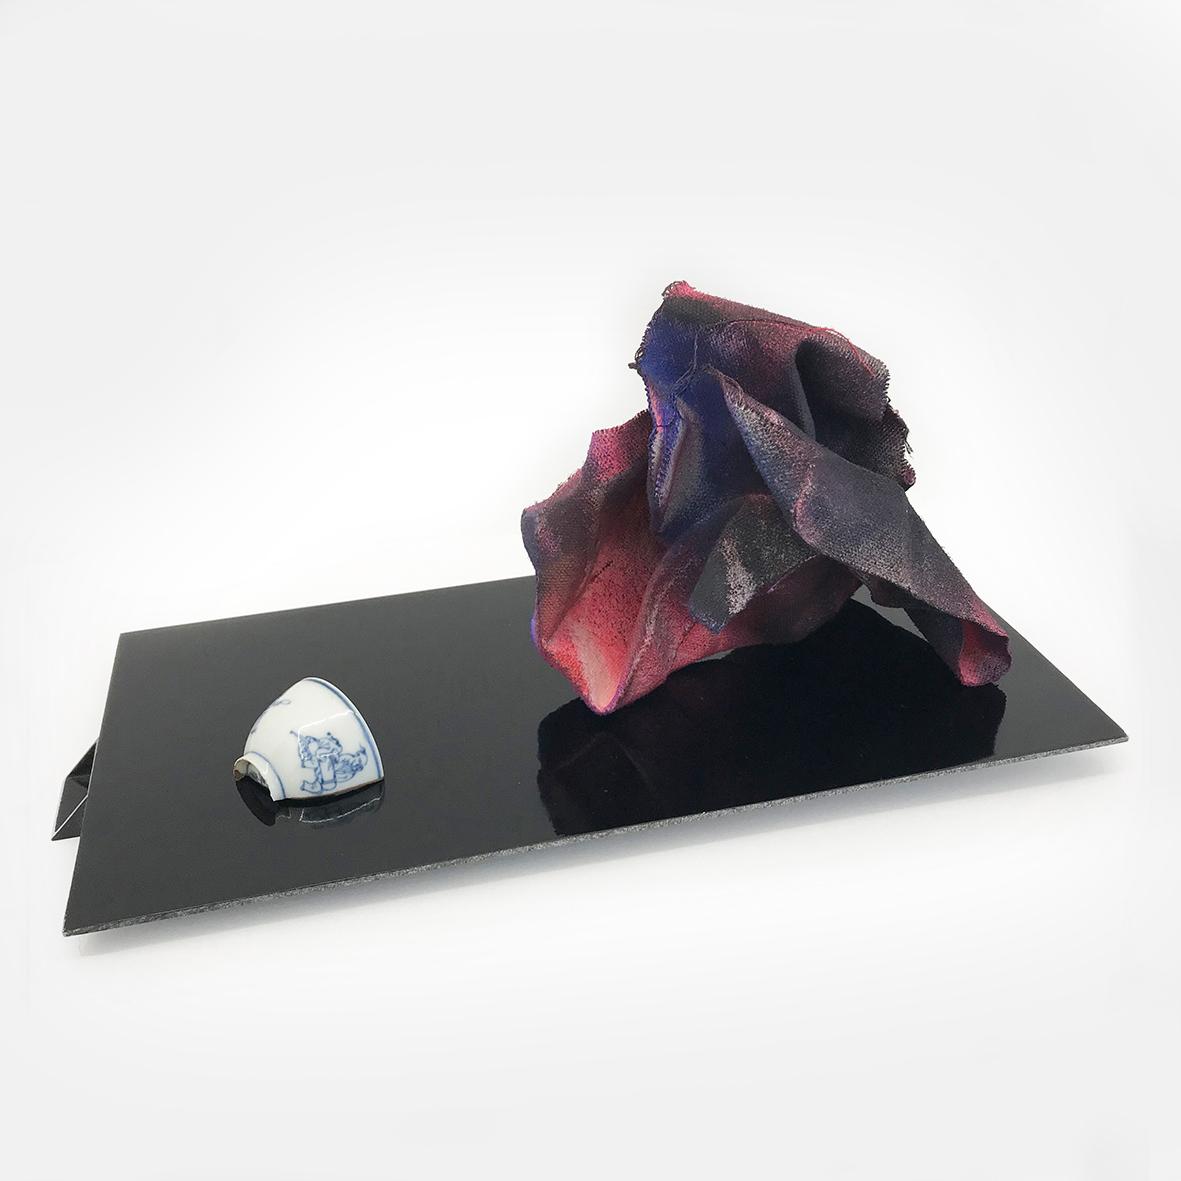 Anna Friedel | Encore | Mixed media | 2020 | basedonart gallery